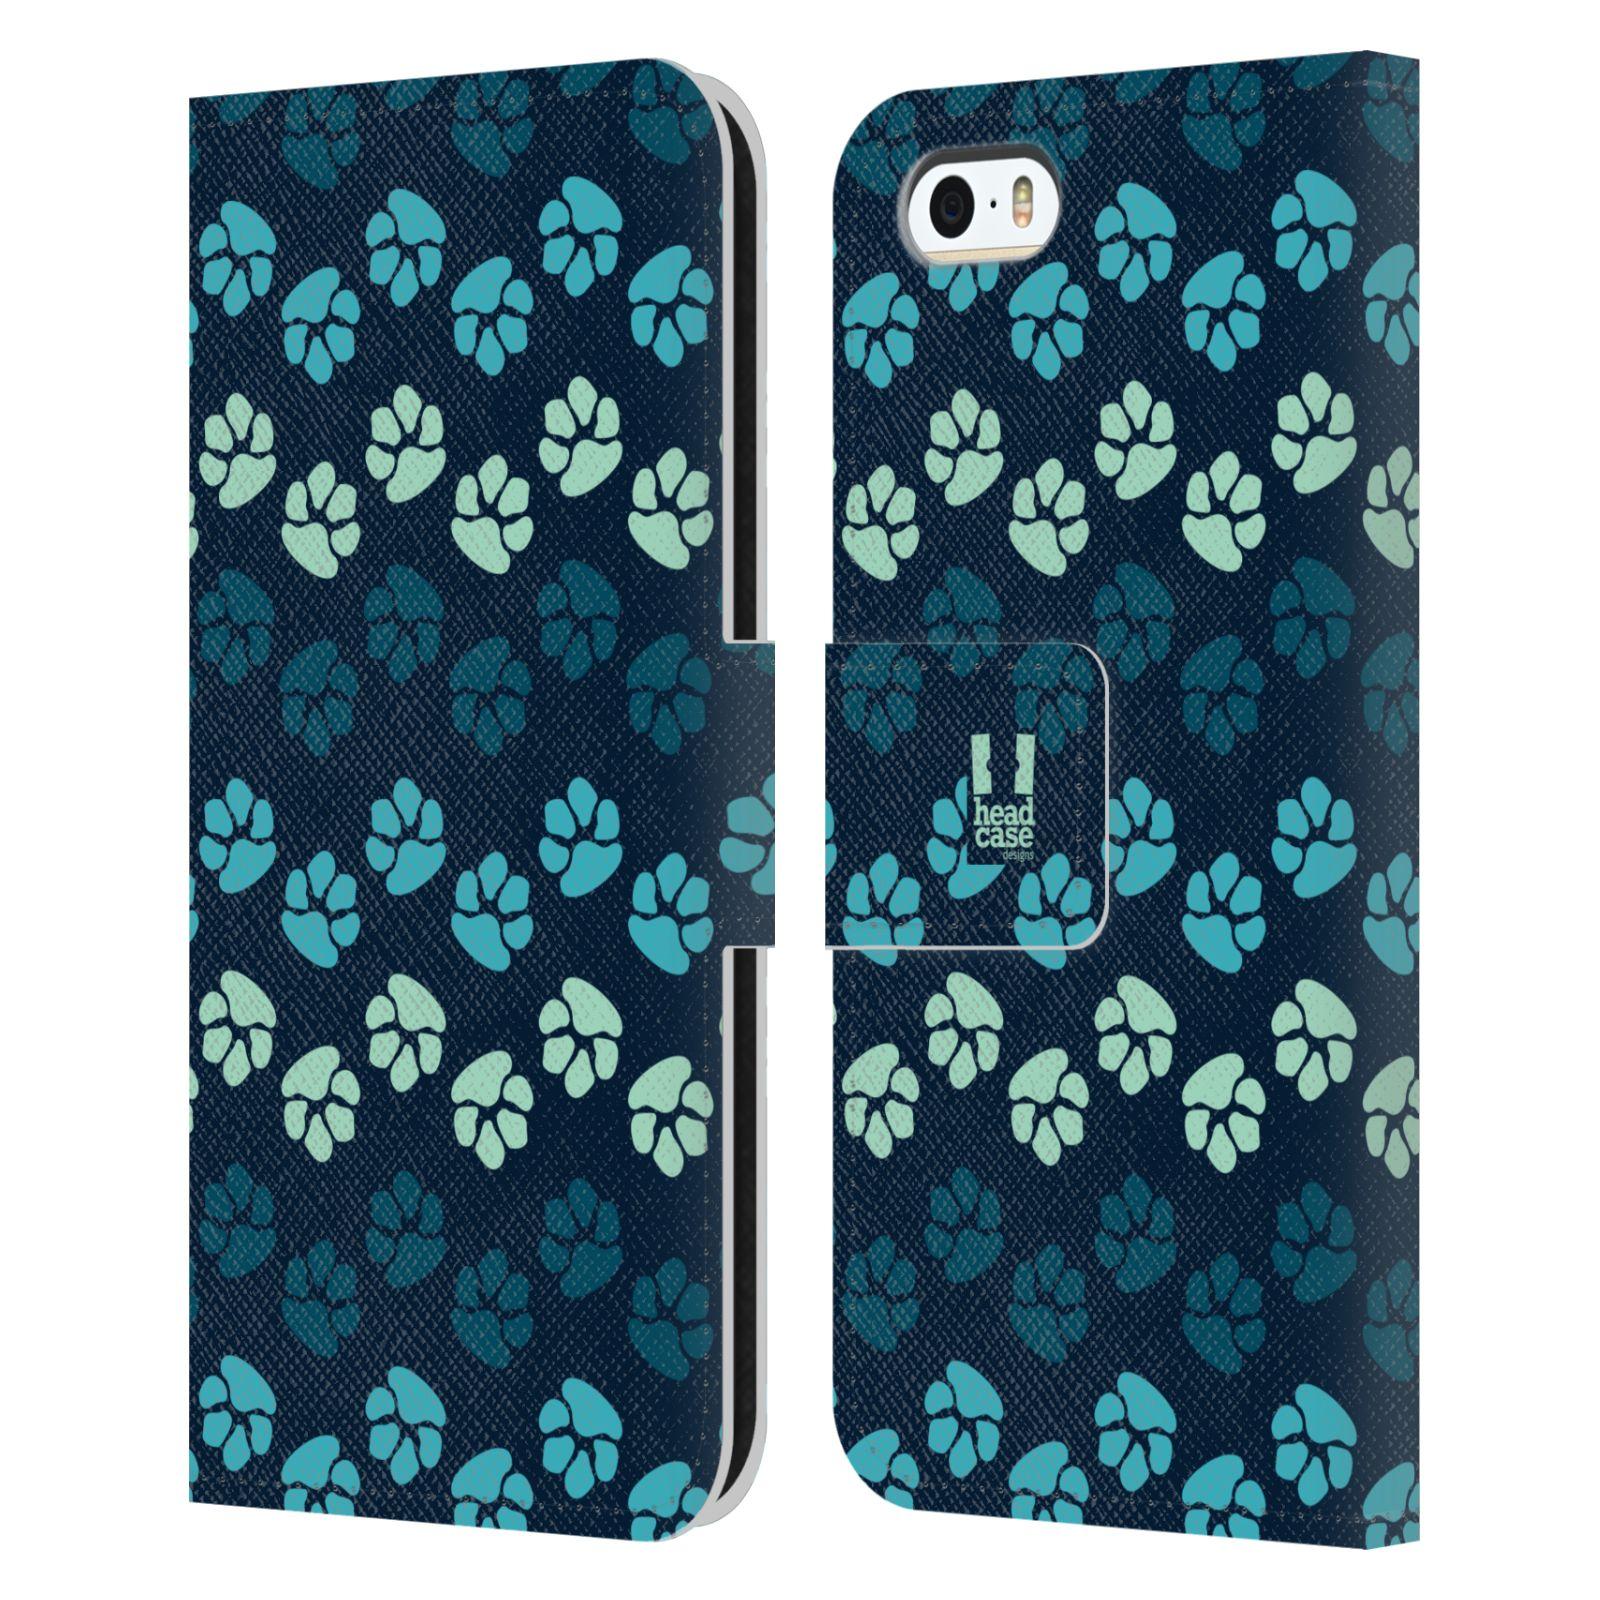 HEAD CASE Flipové pouzdro pro mobil Apple Iphone 5/5s Pejsek ťapky modrá barva